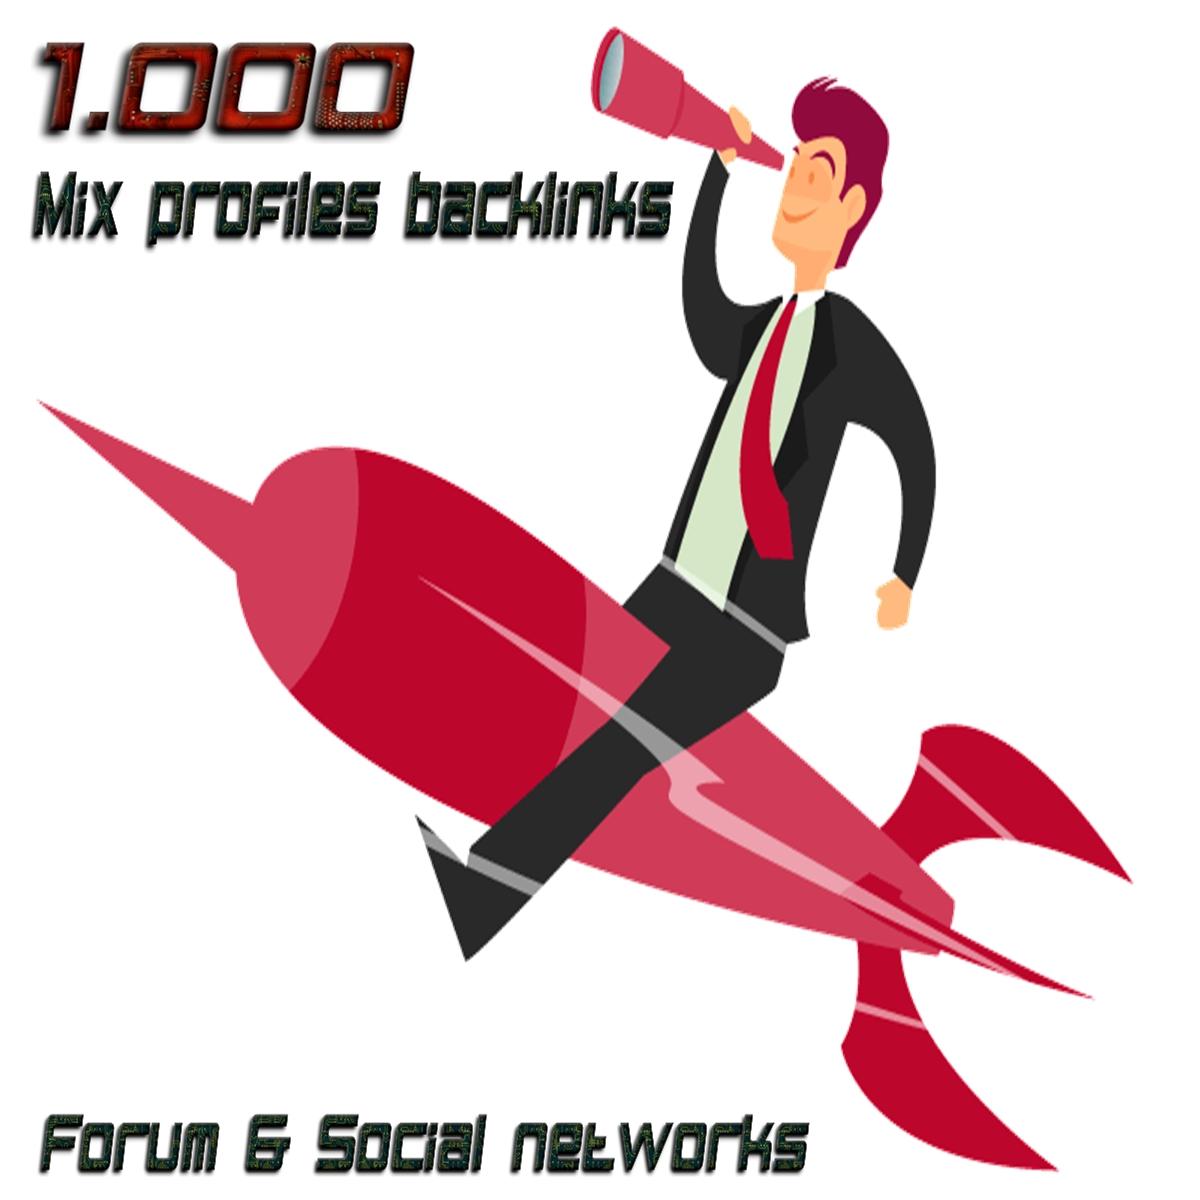 1.000 Mix profiles backlinks forum & social networks HIGH QUALITY